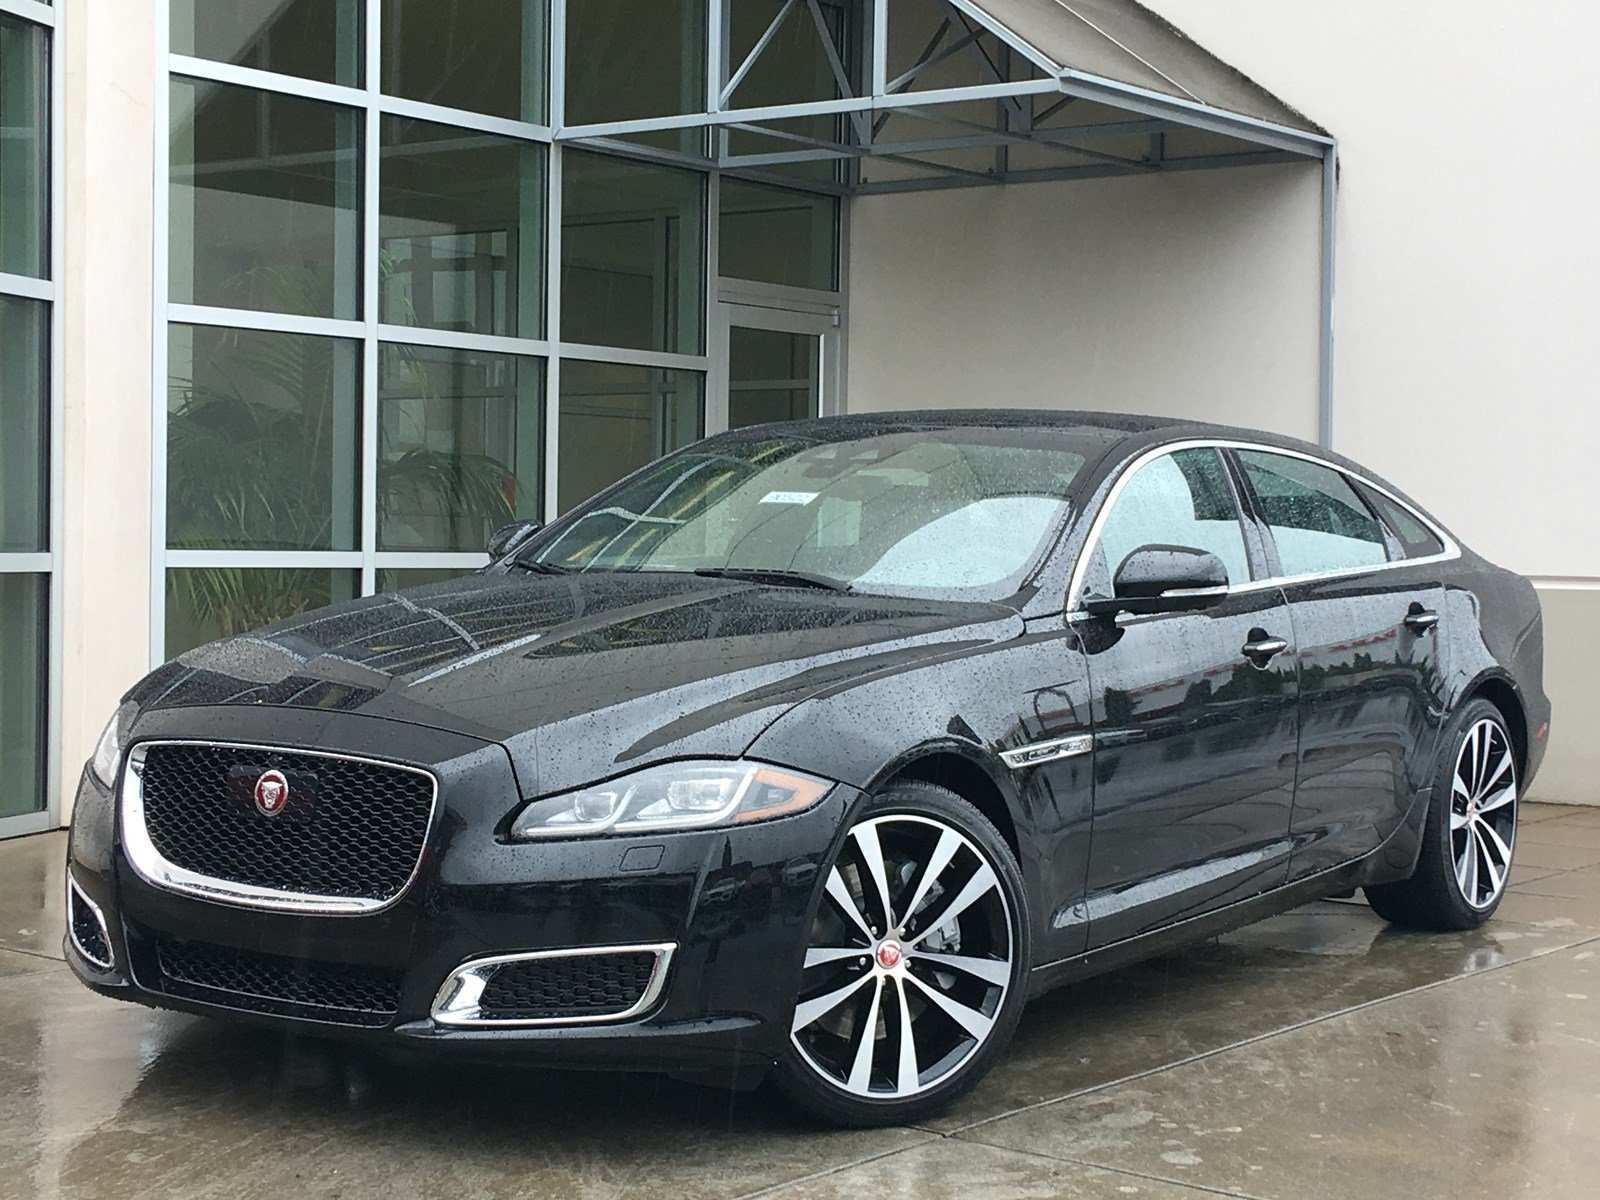 98 New Xj Jaguar 2019 Spesification by Xj Jaguar 2019